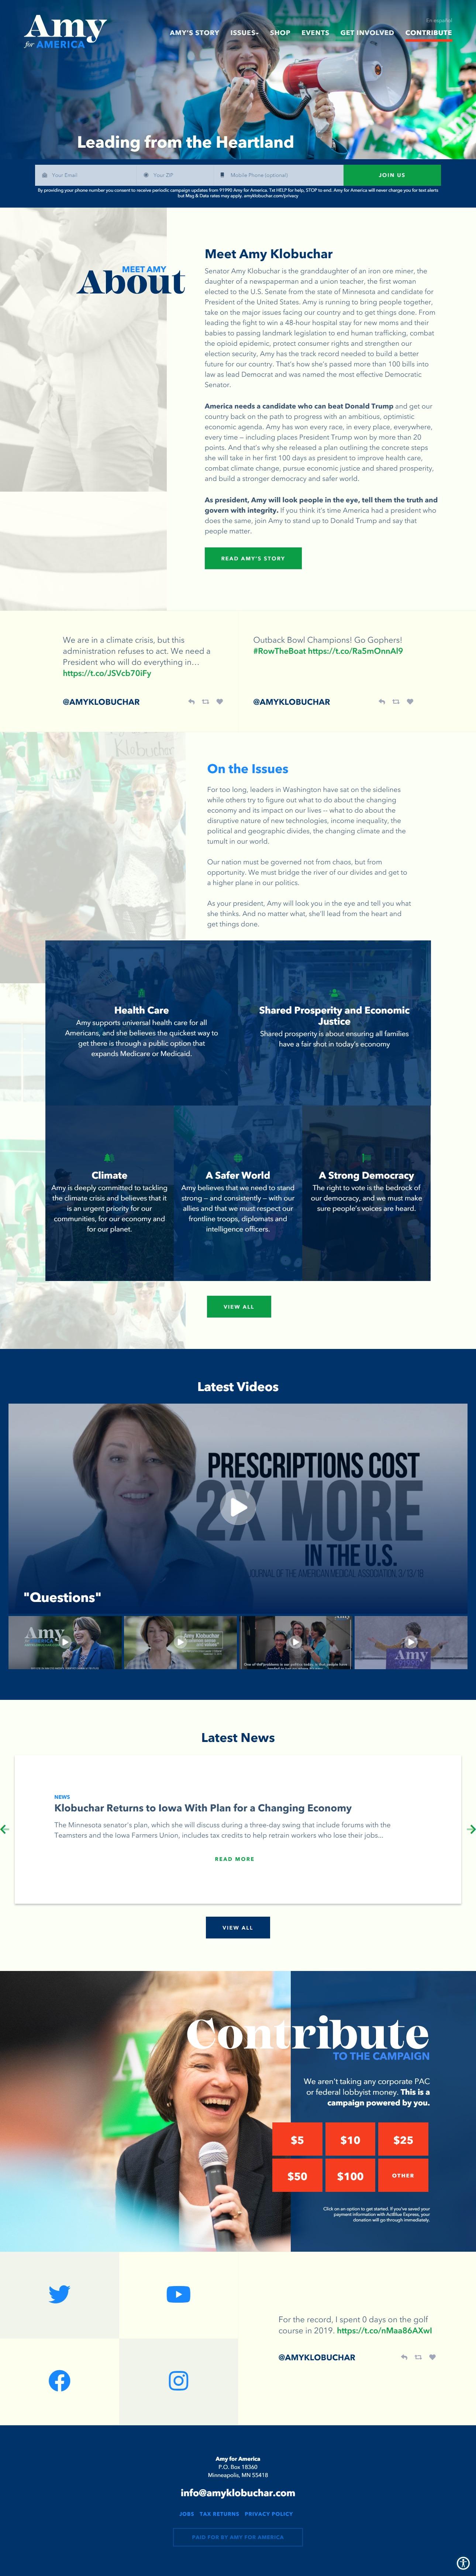 Homepage Snapshot for January 1, 2020: Senator Amy Klobuchar